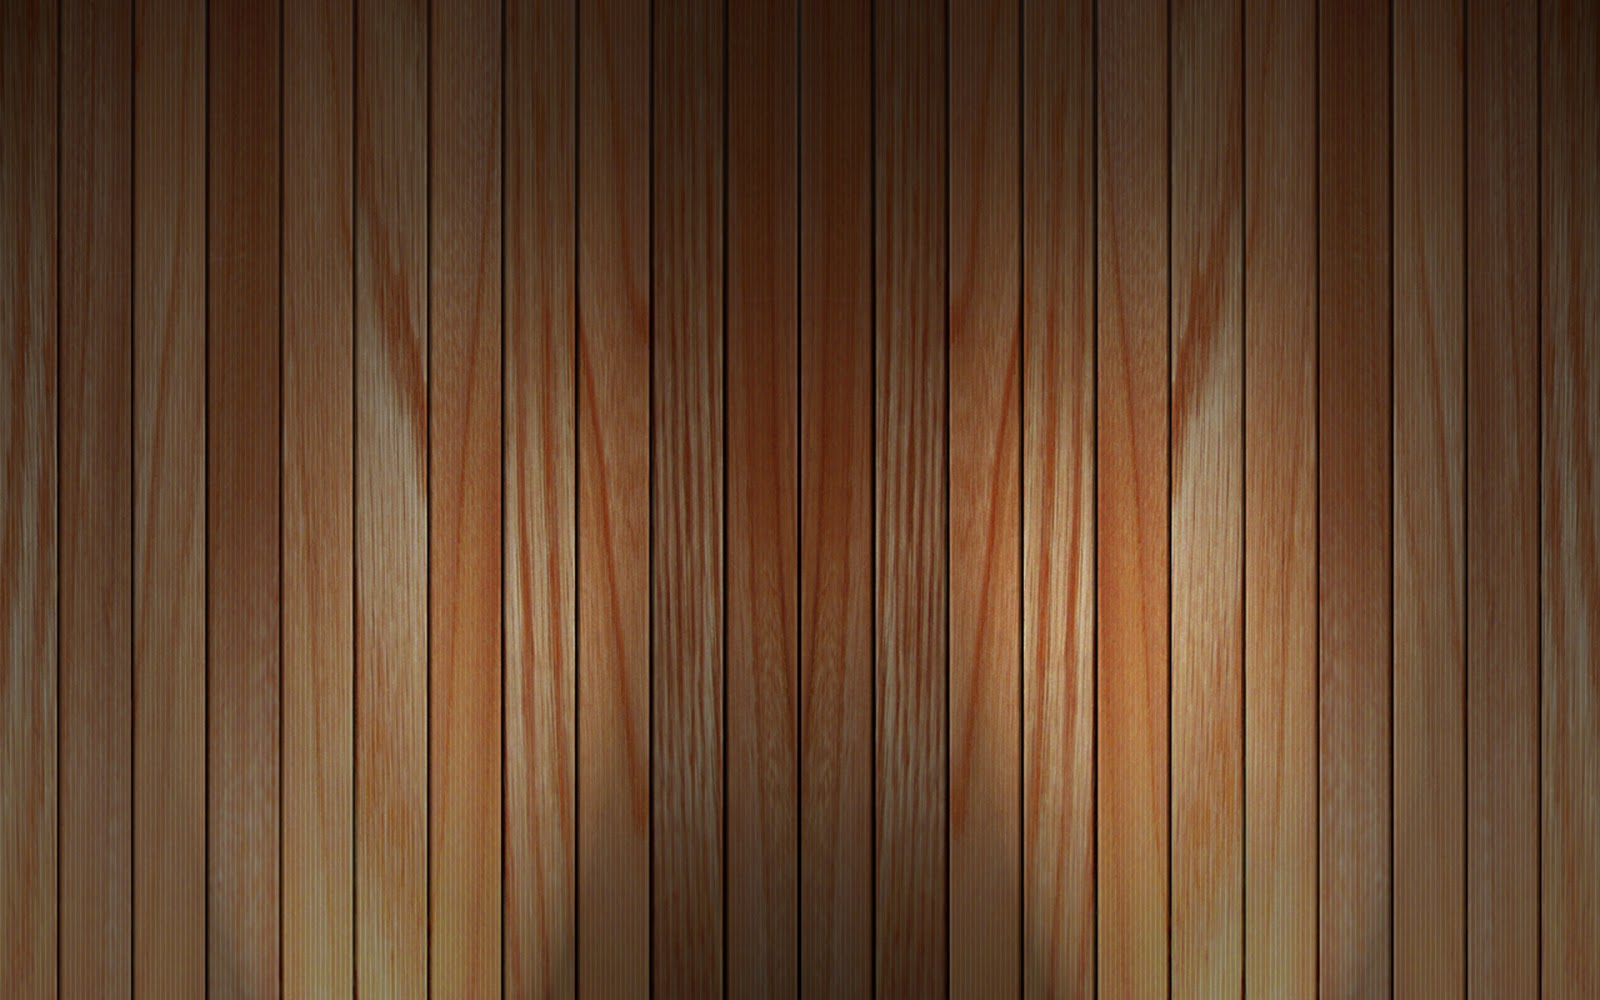 HD Wallpapers Desktop: Simple (Plain) HD DeskTop Wallpapers HTML code